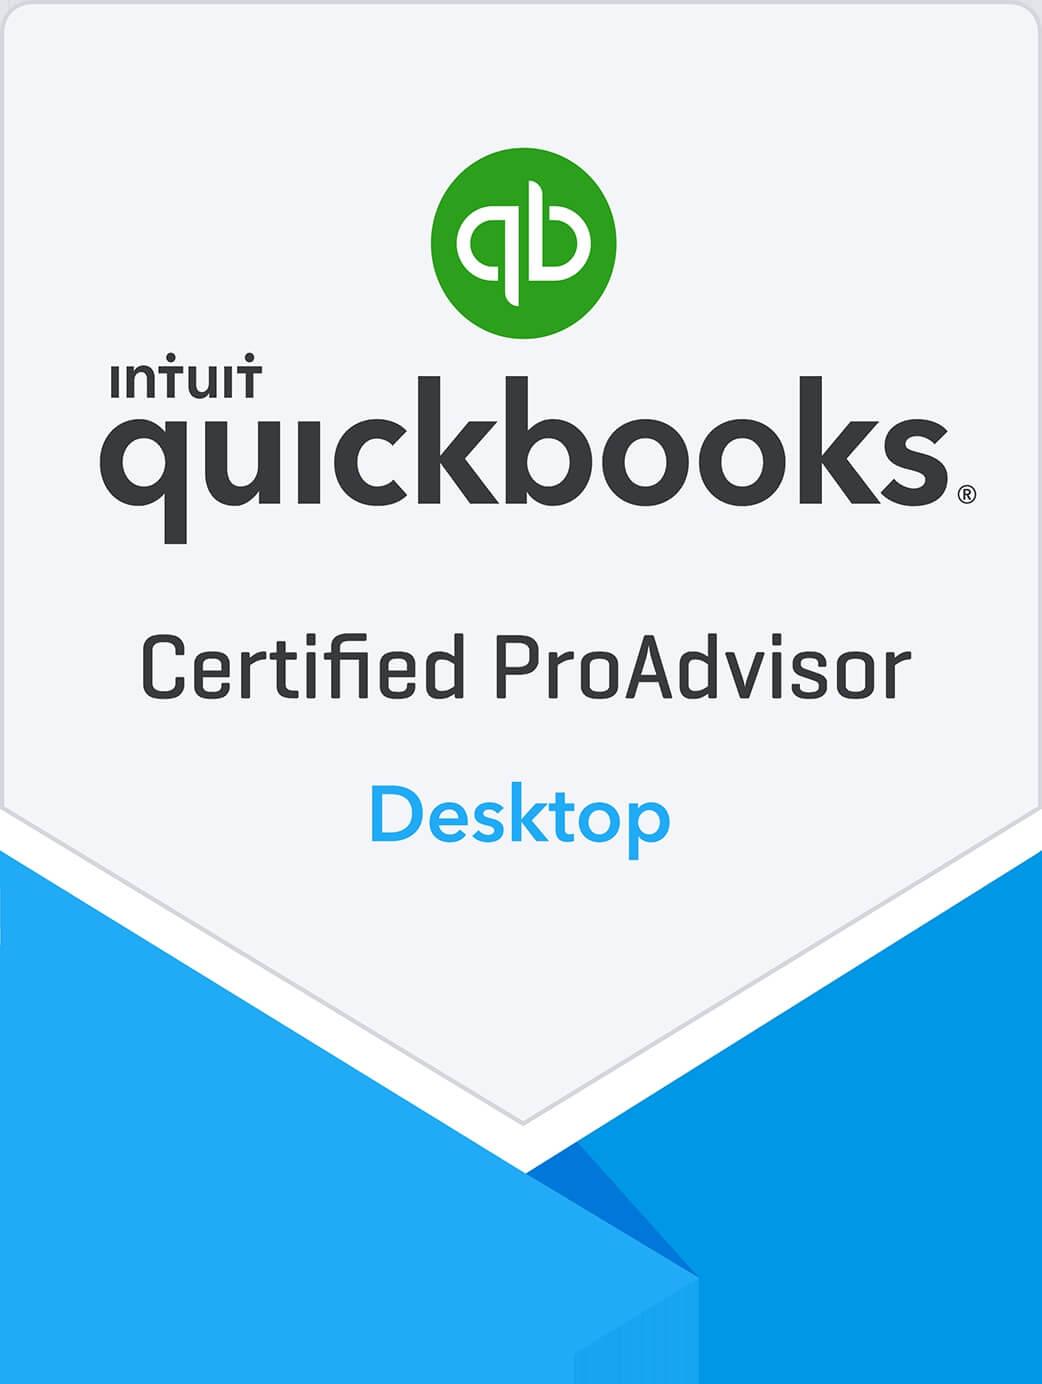 Certified QuickBooks Desktop ProAdvisor Badge